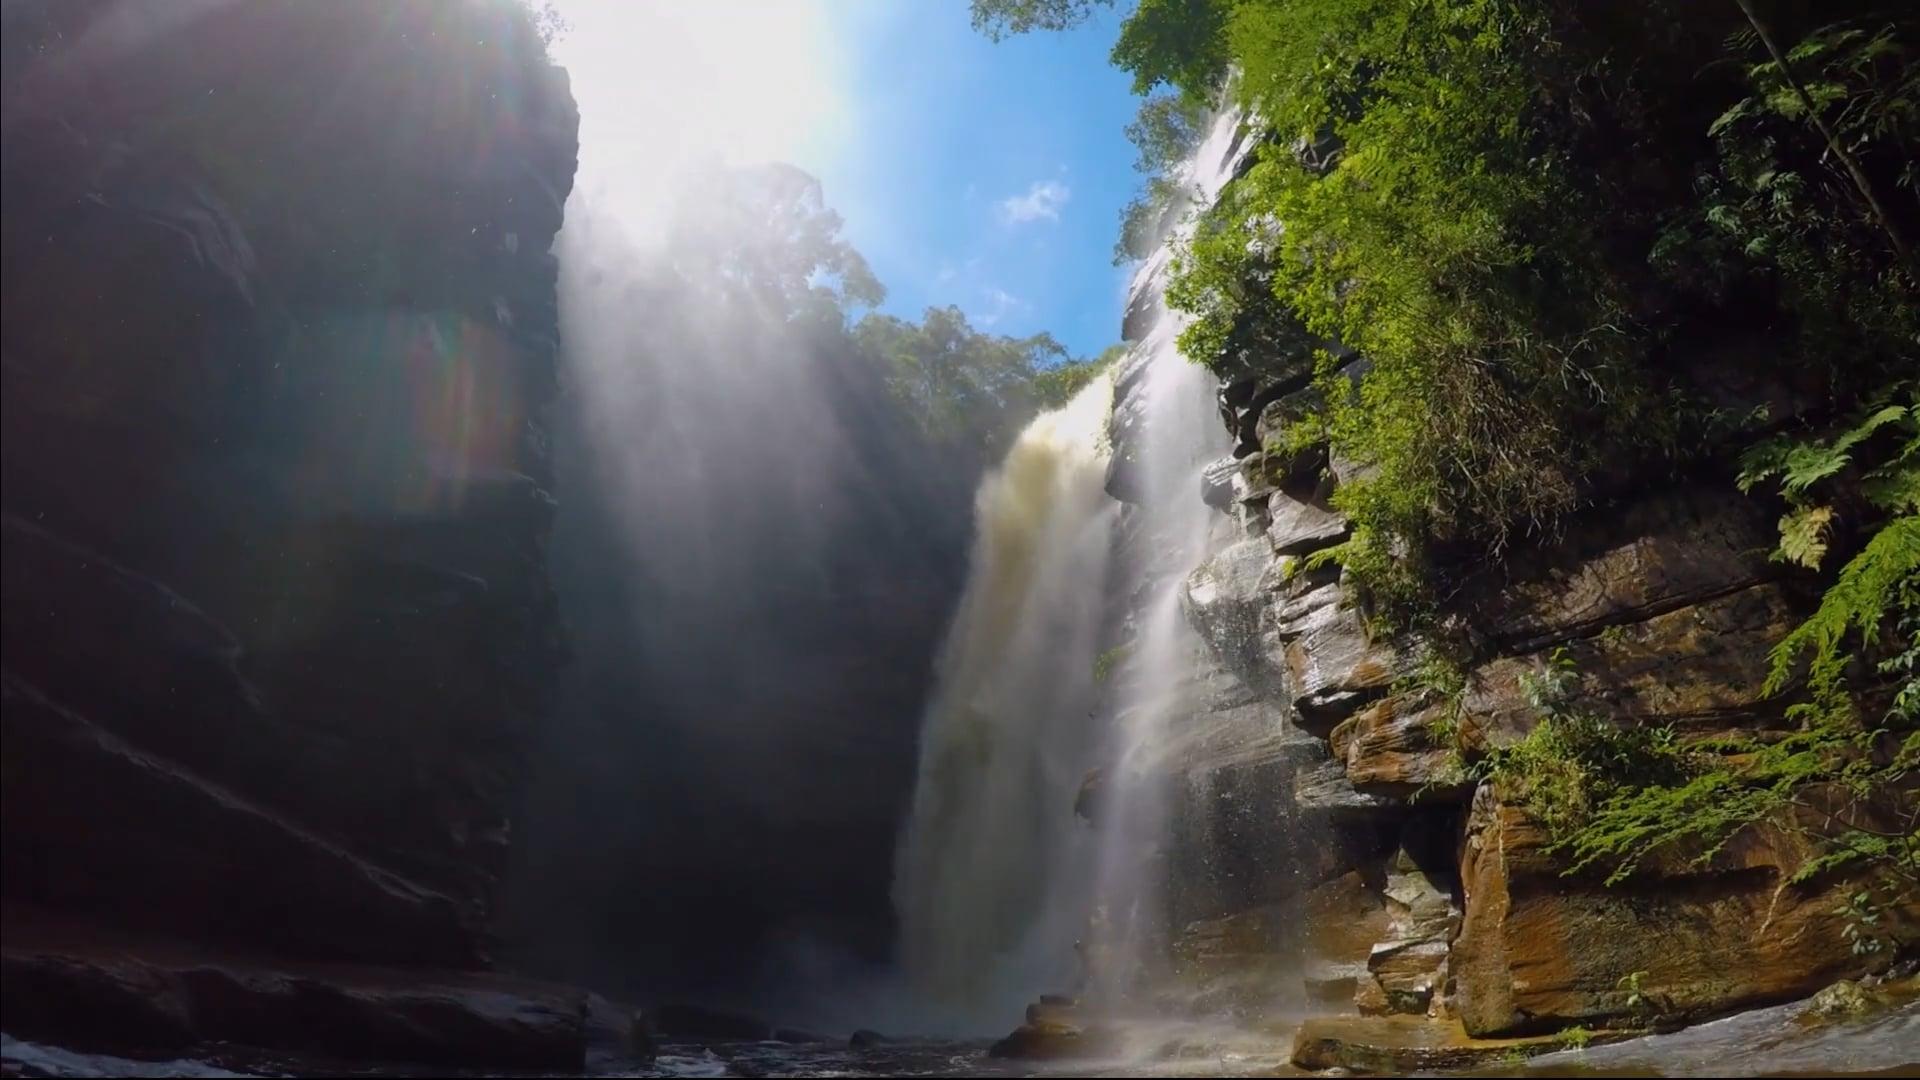 Cachoeira do Mosquito, Chapada Diamantina